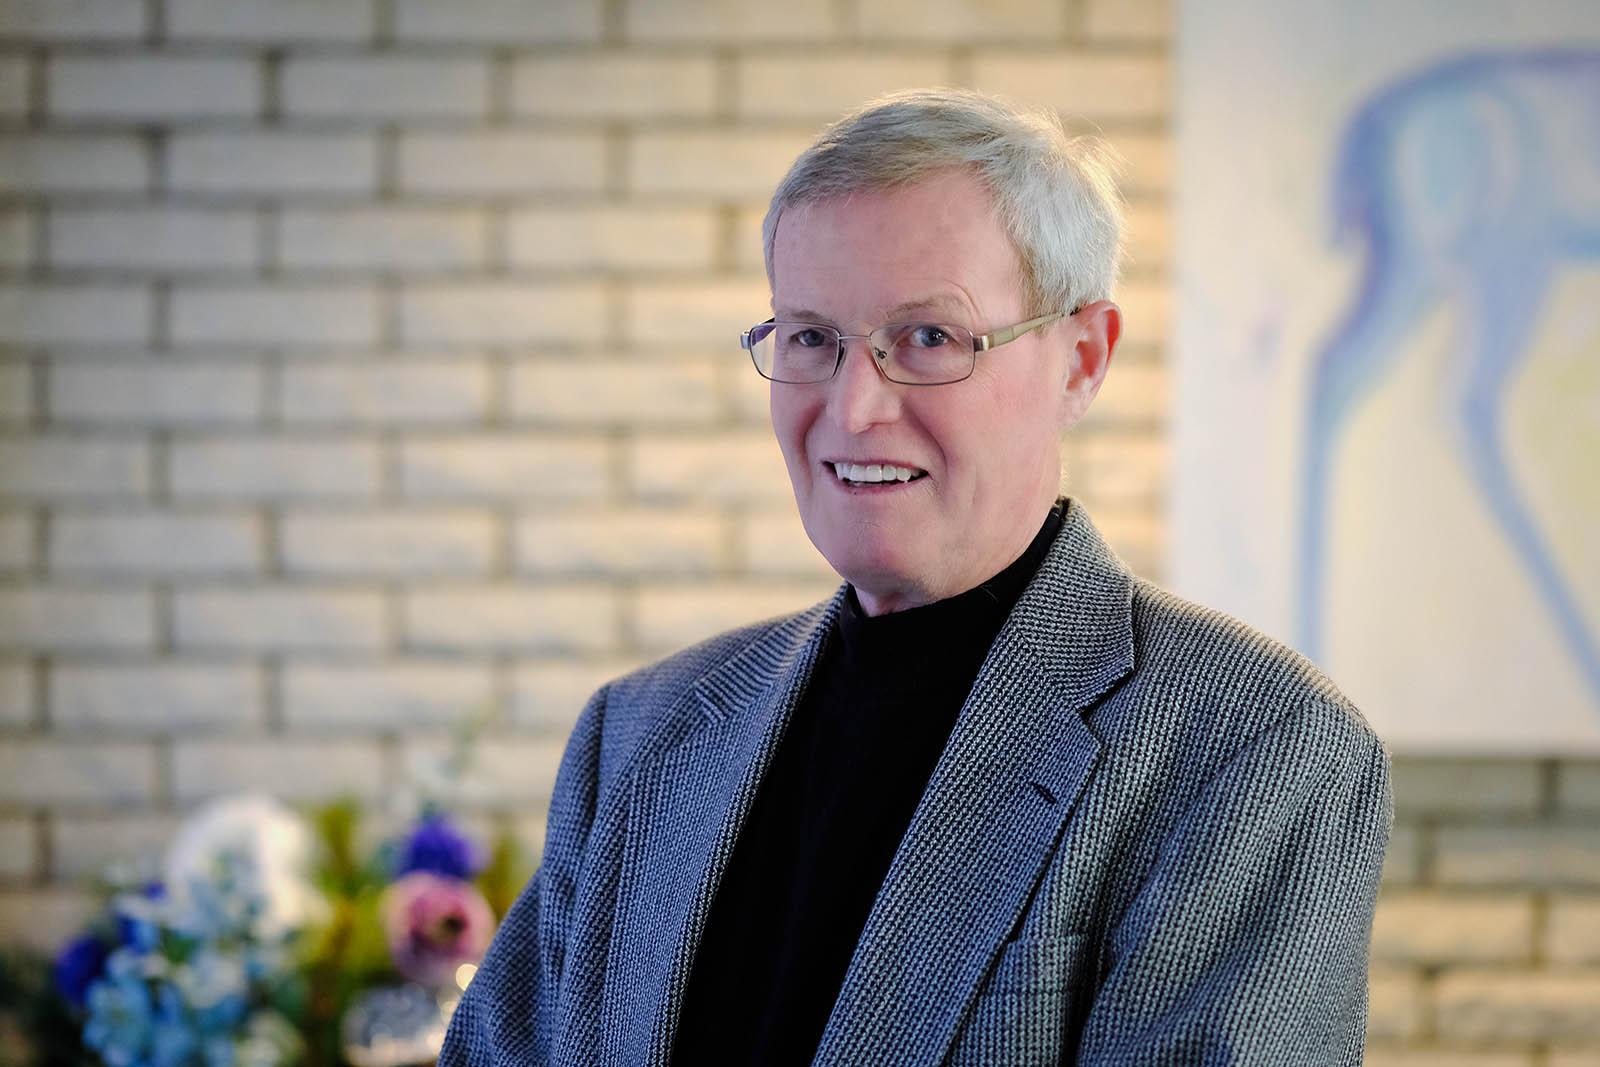 Dr. Frank Dawe